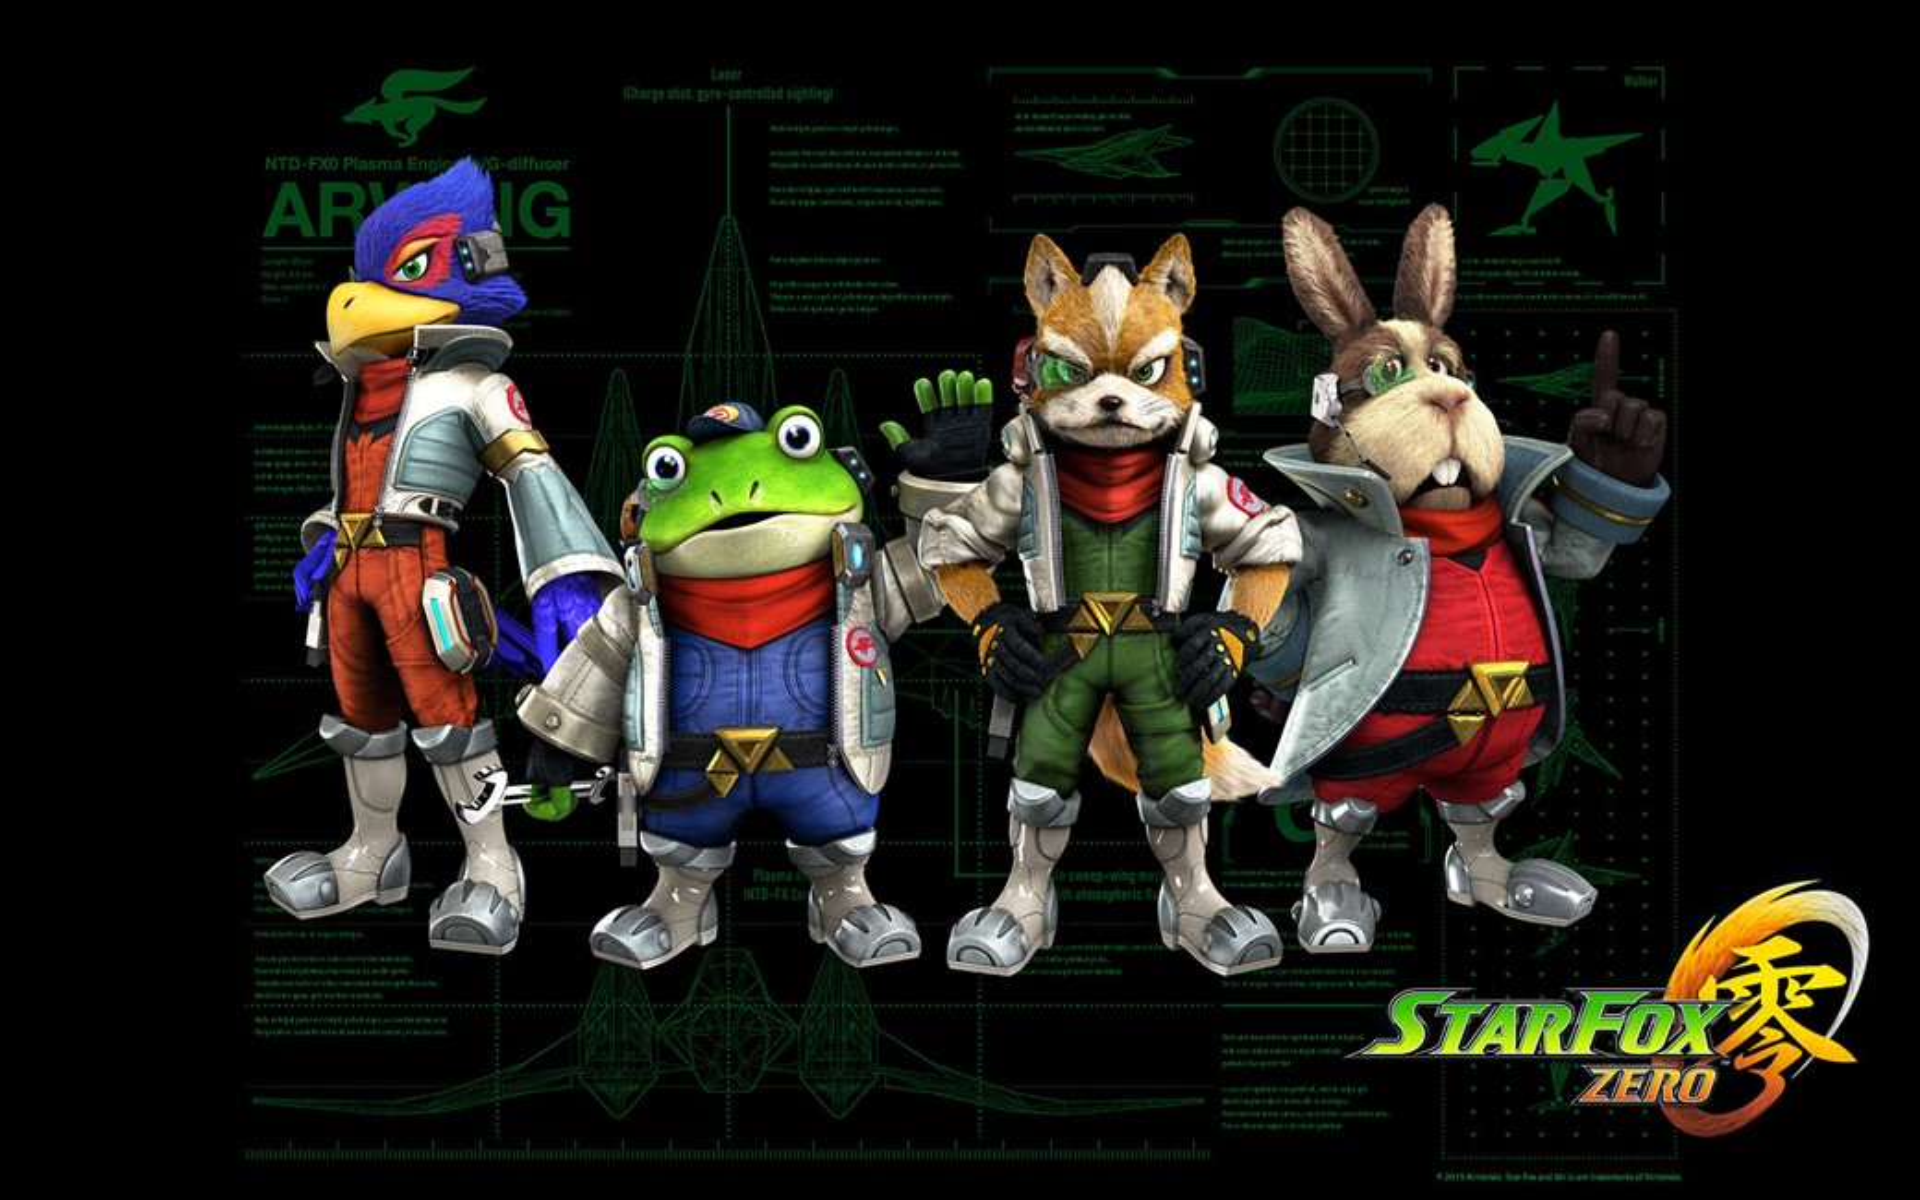 Adiado há 22 anos, Star Fox 2 finalmente será lançado para o SNES mini